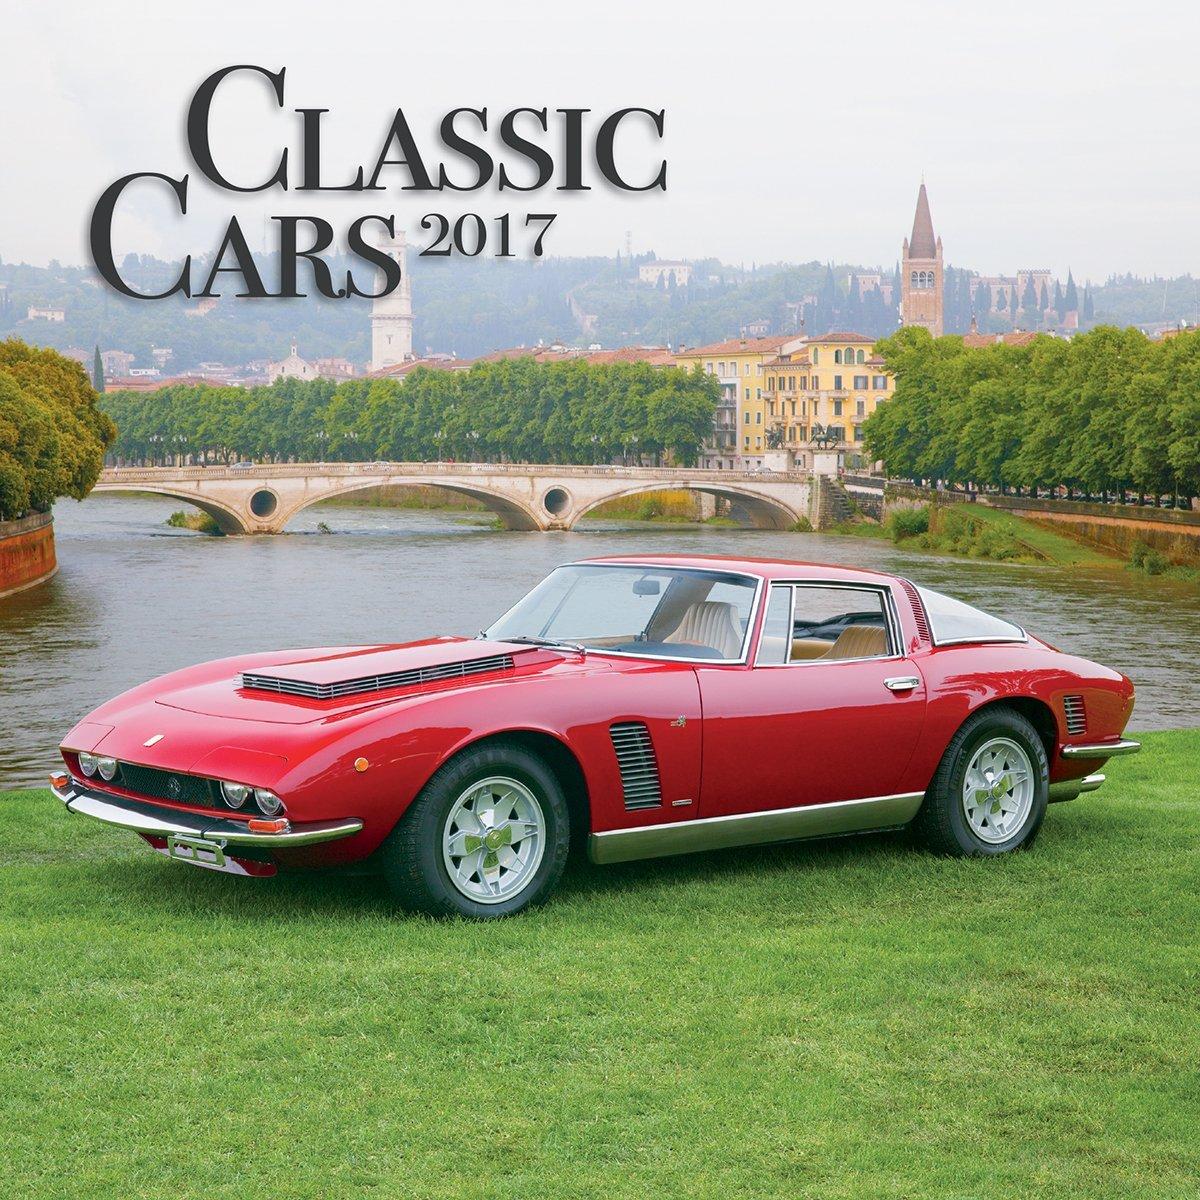 Turner Photo 2017 Classic Cars Photo Wall Calendar, 12 x 24 inches ...